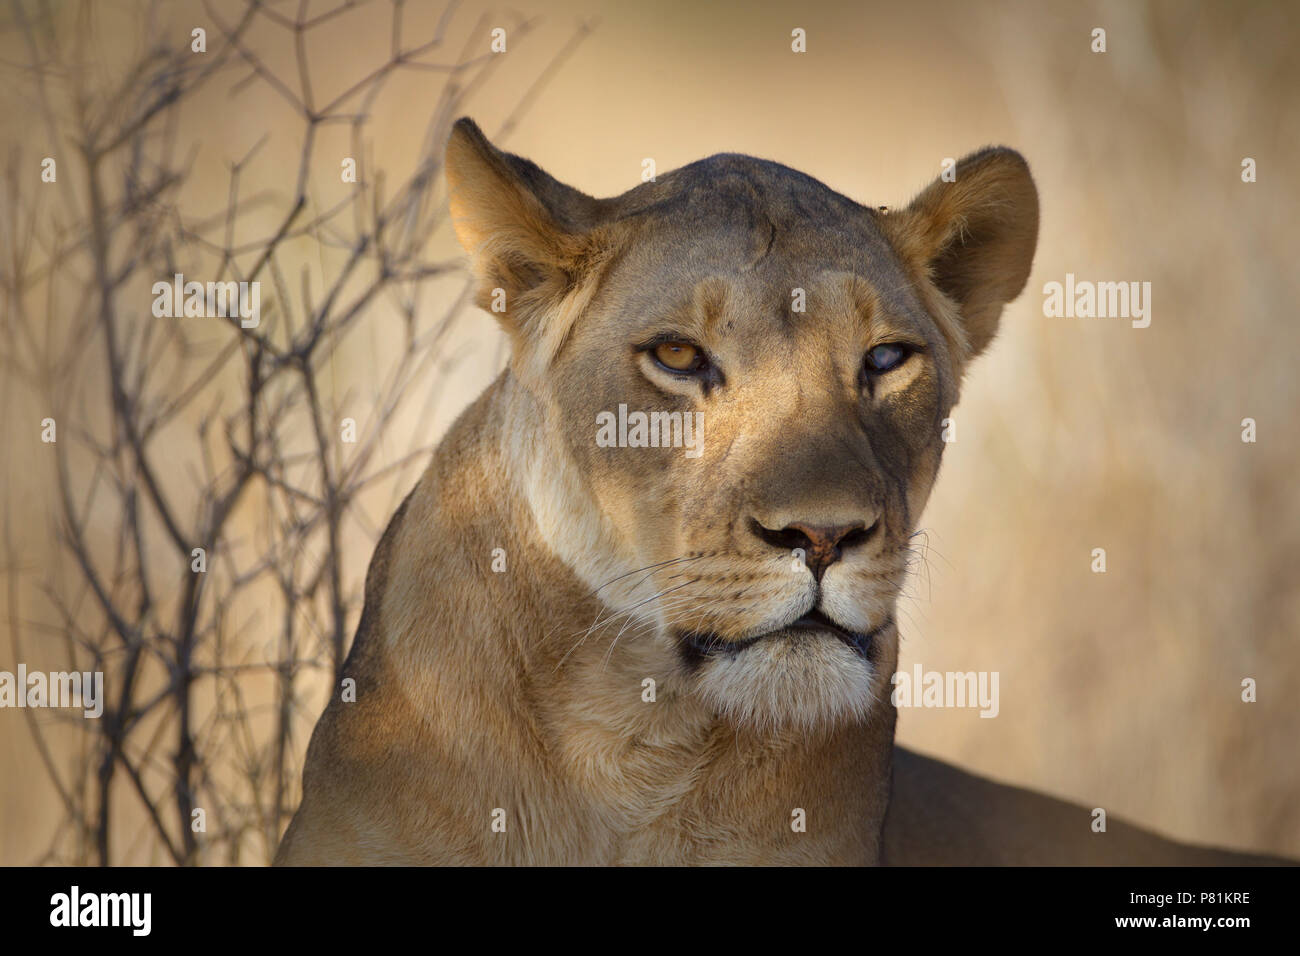 Ojo de plata lavica retrato cercano con una feroz intimidante buscando lion Imagen De Stock